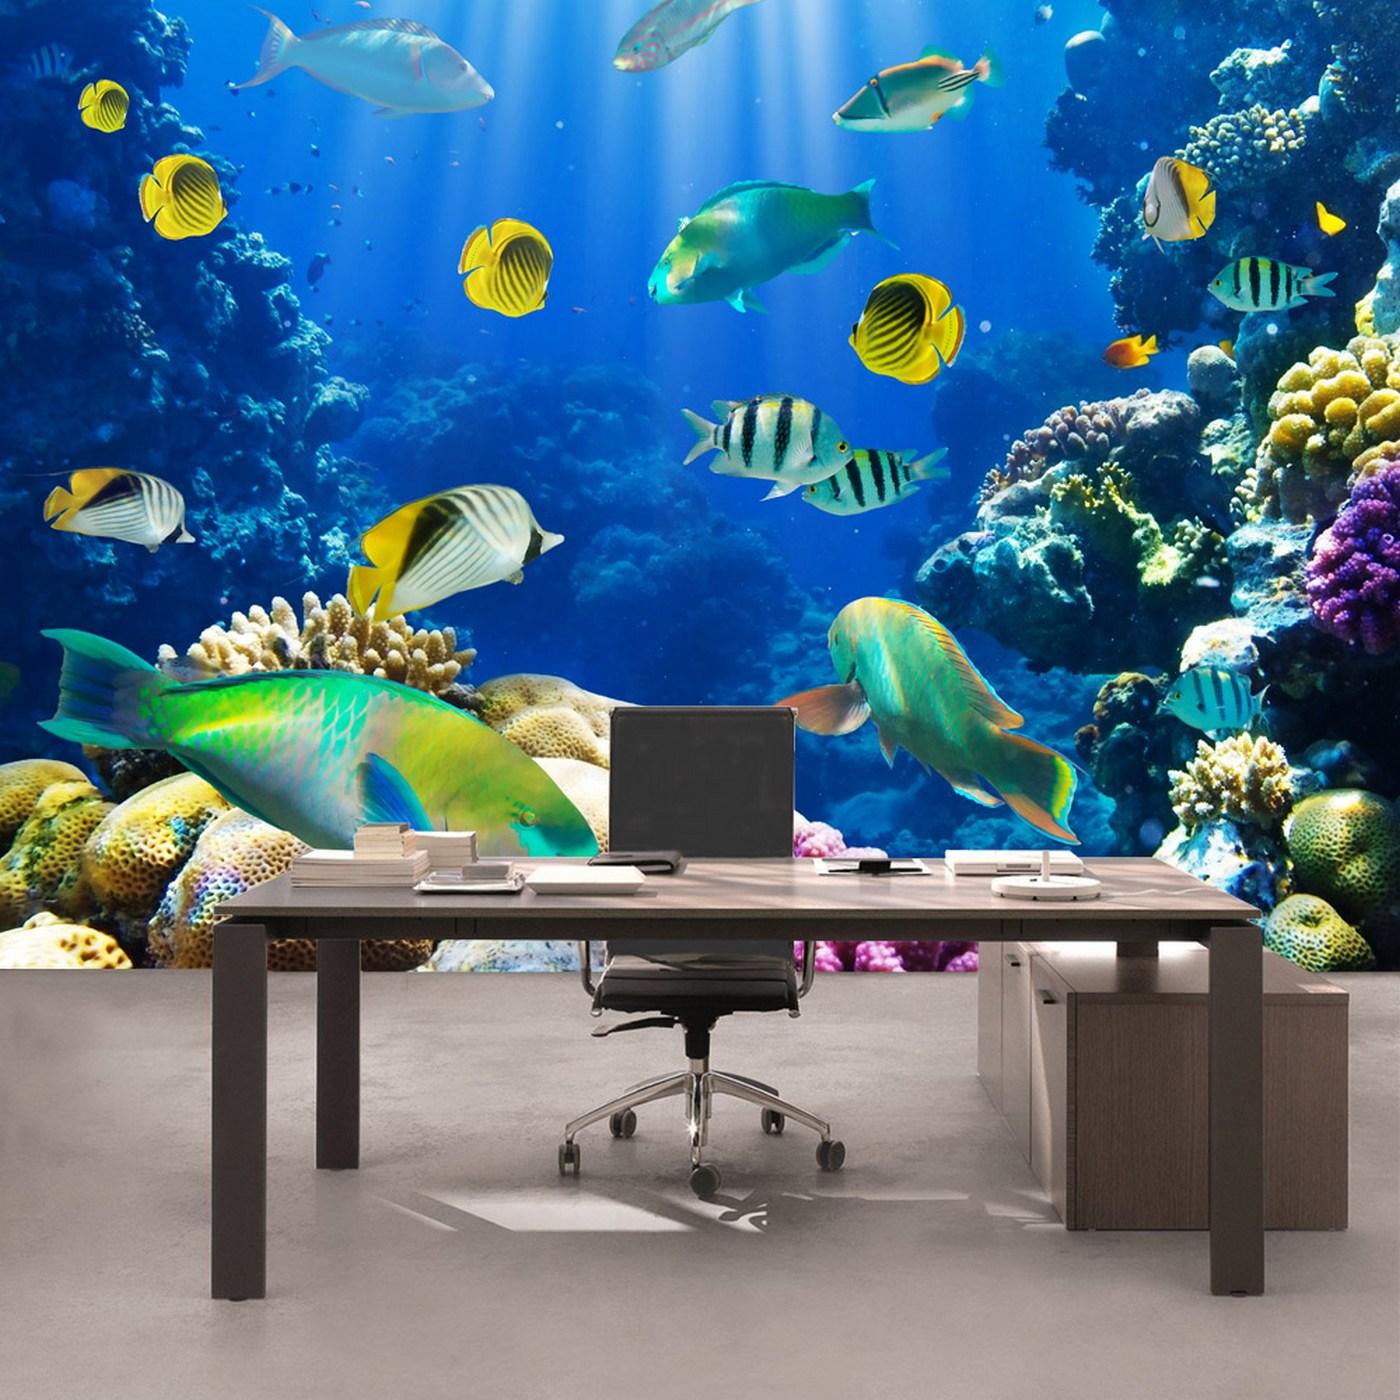 Vlies Fototapete  Underwater Worldtiere Tapete Aquarium Unterwasser Meereswelt Meer Fische Riff Korallenriff Blau